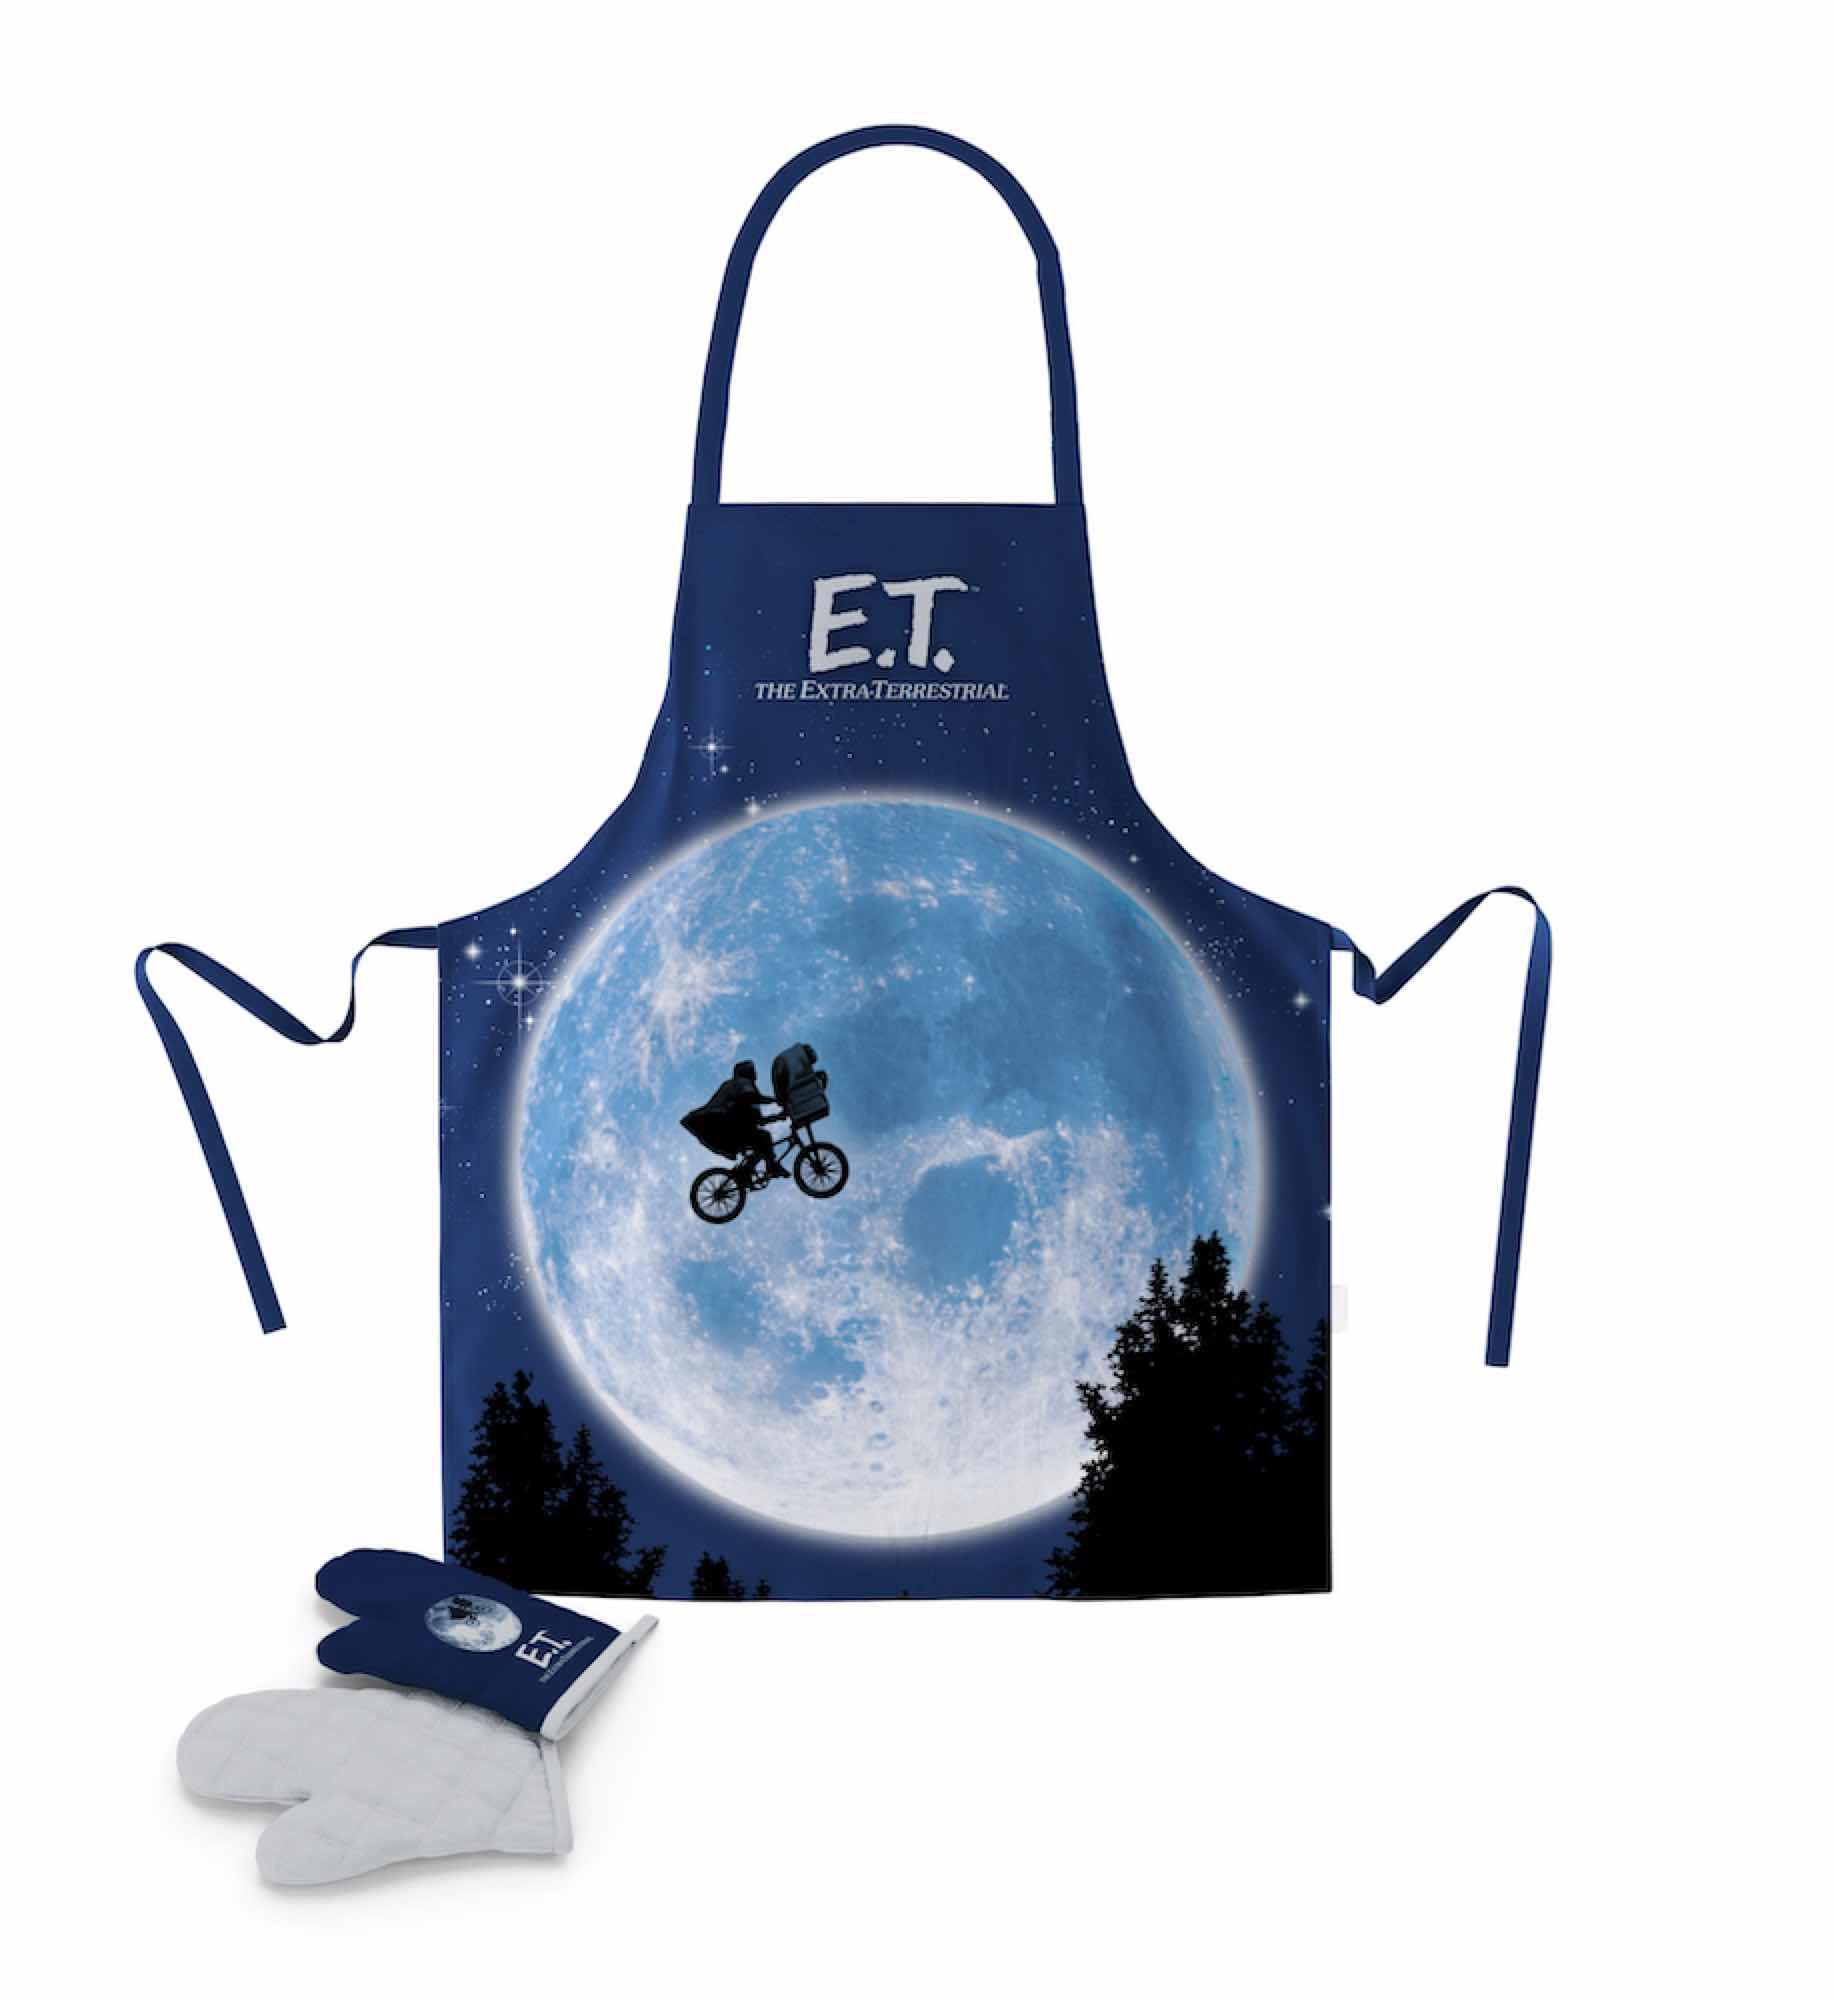 E.T. POSTER DELANTAL Y MANOPLA PACK TRANSPARENTE E.T.